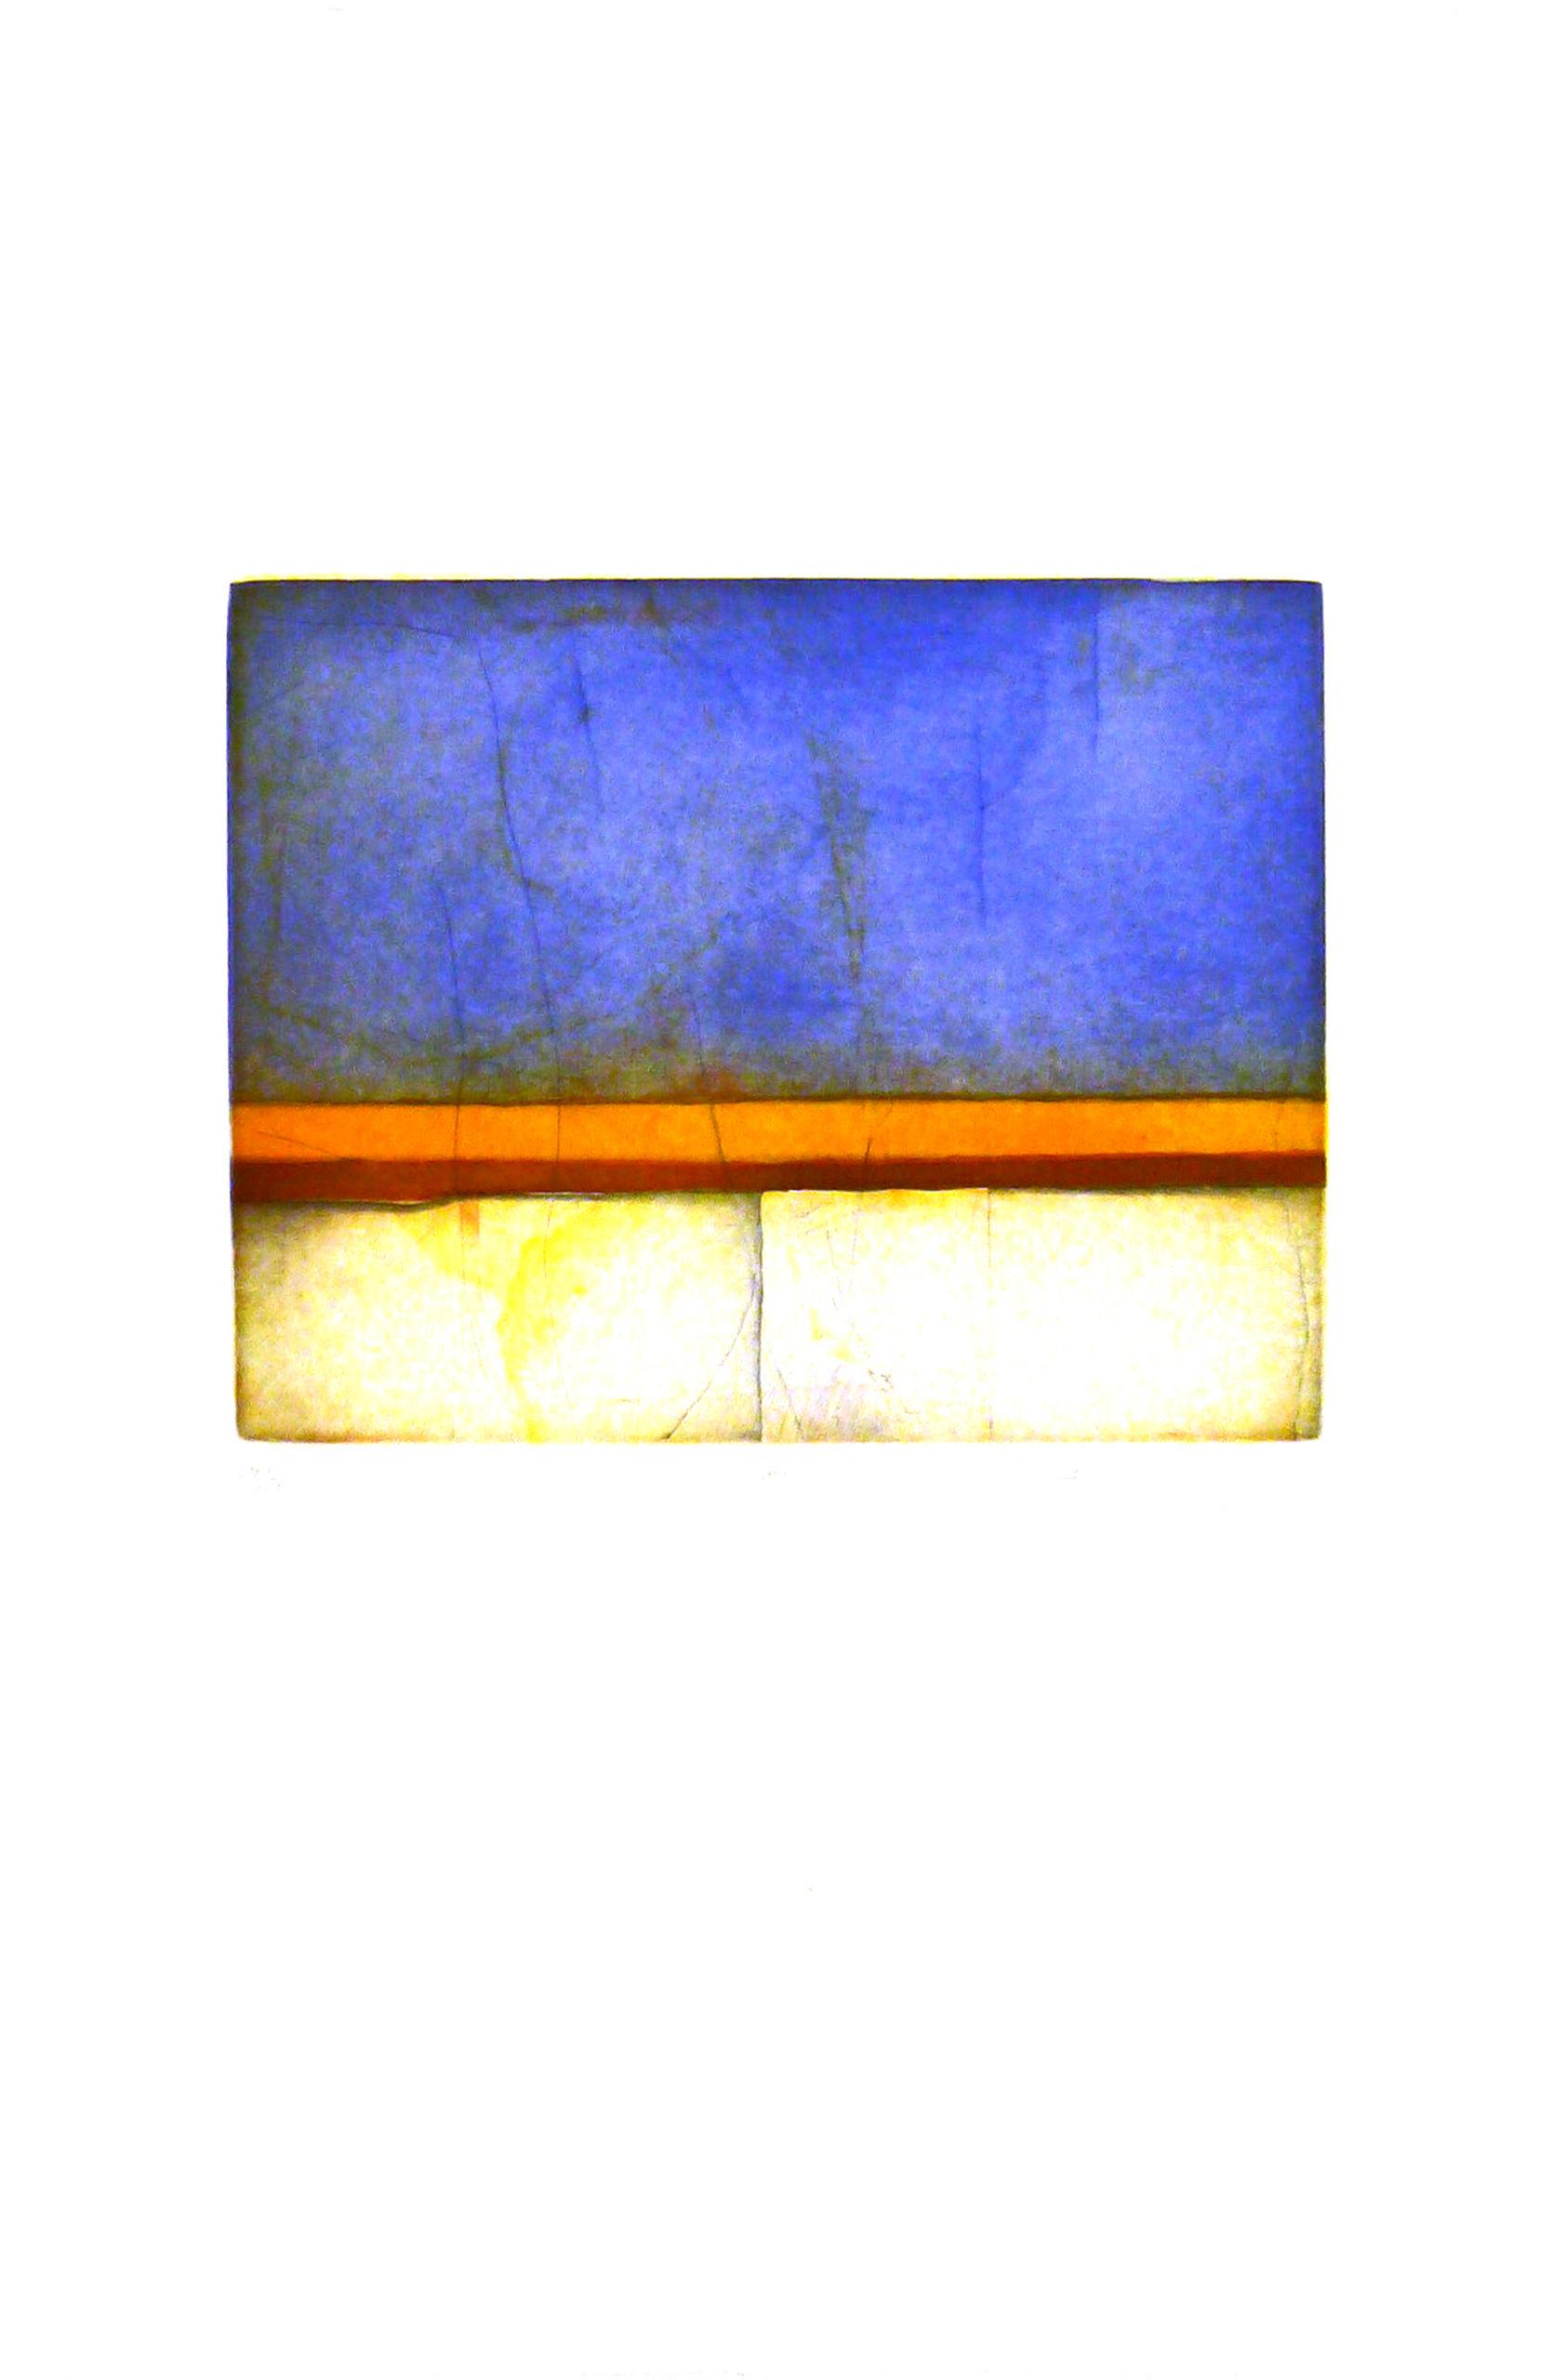 christian-bozon-mar-gravure